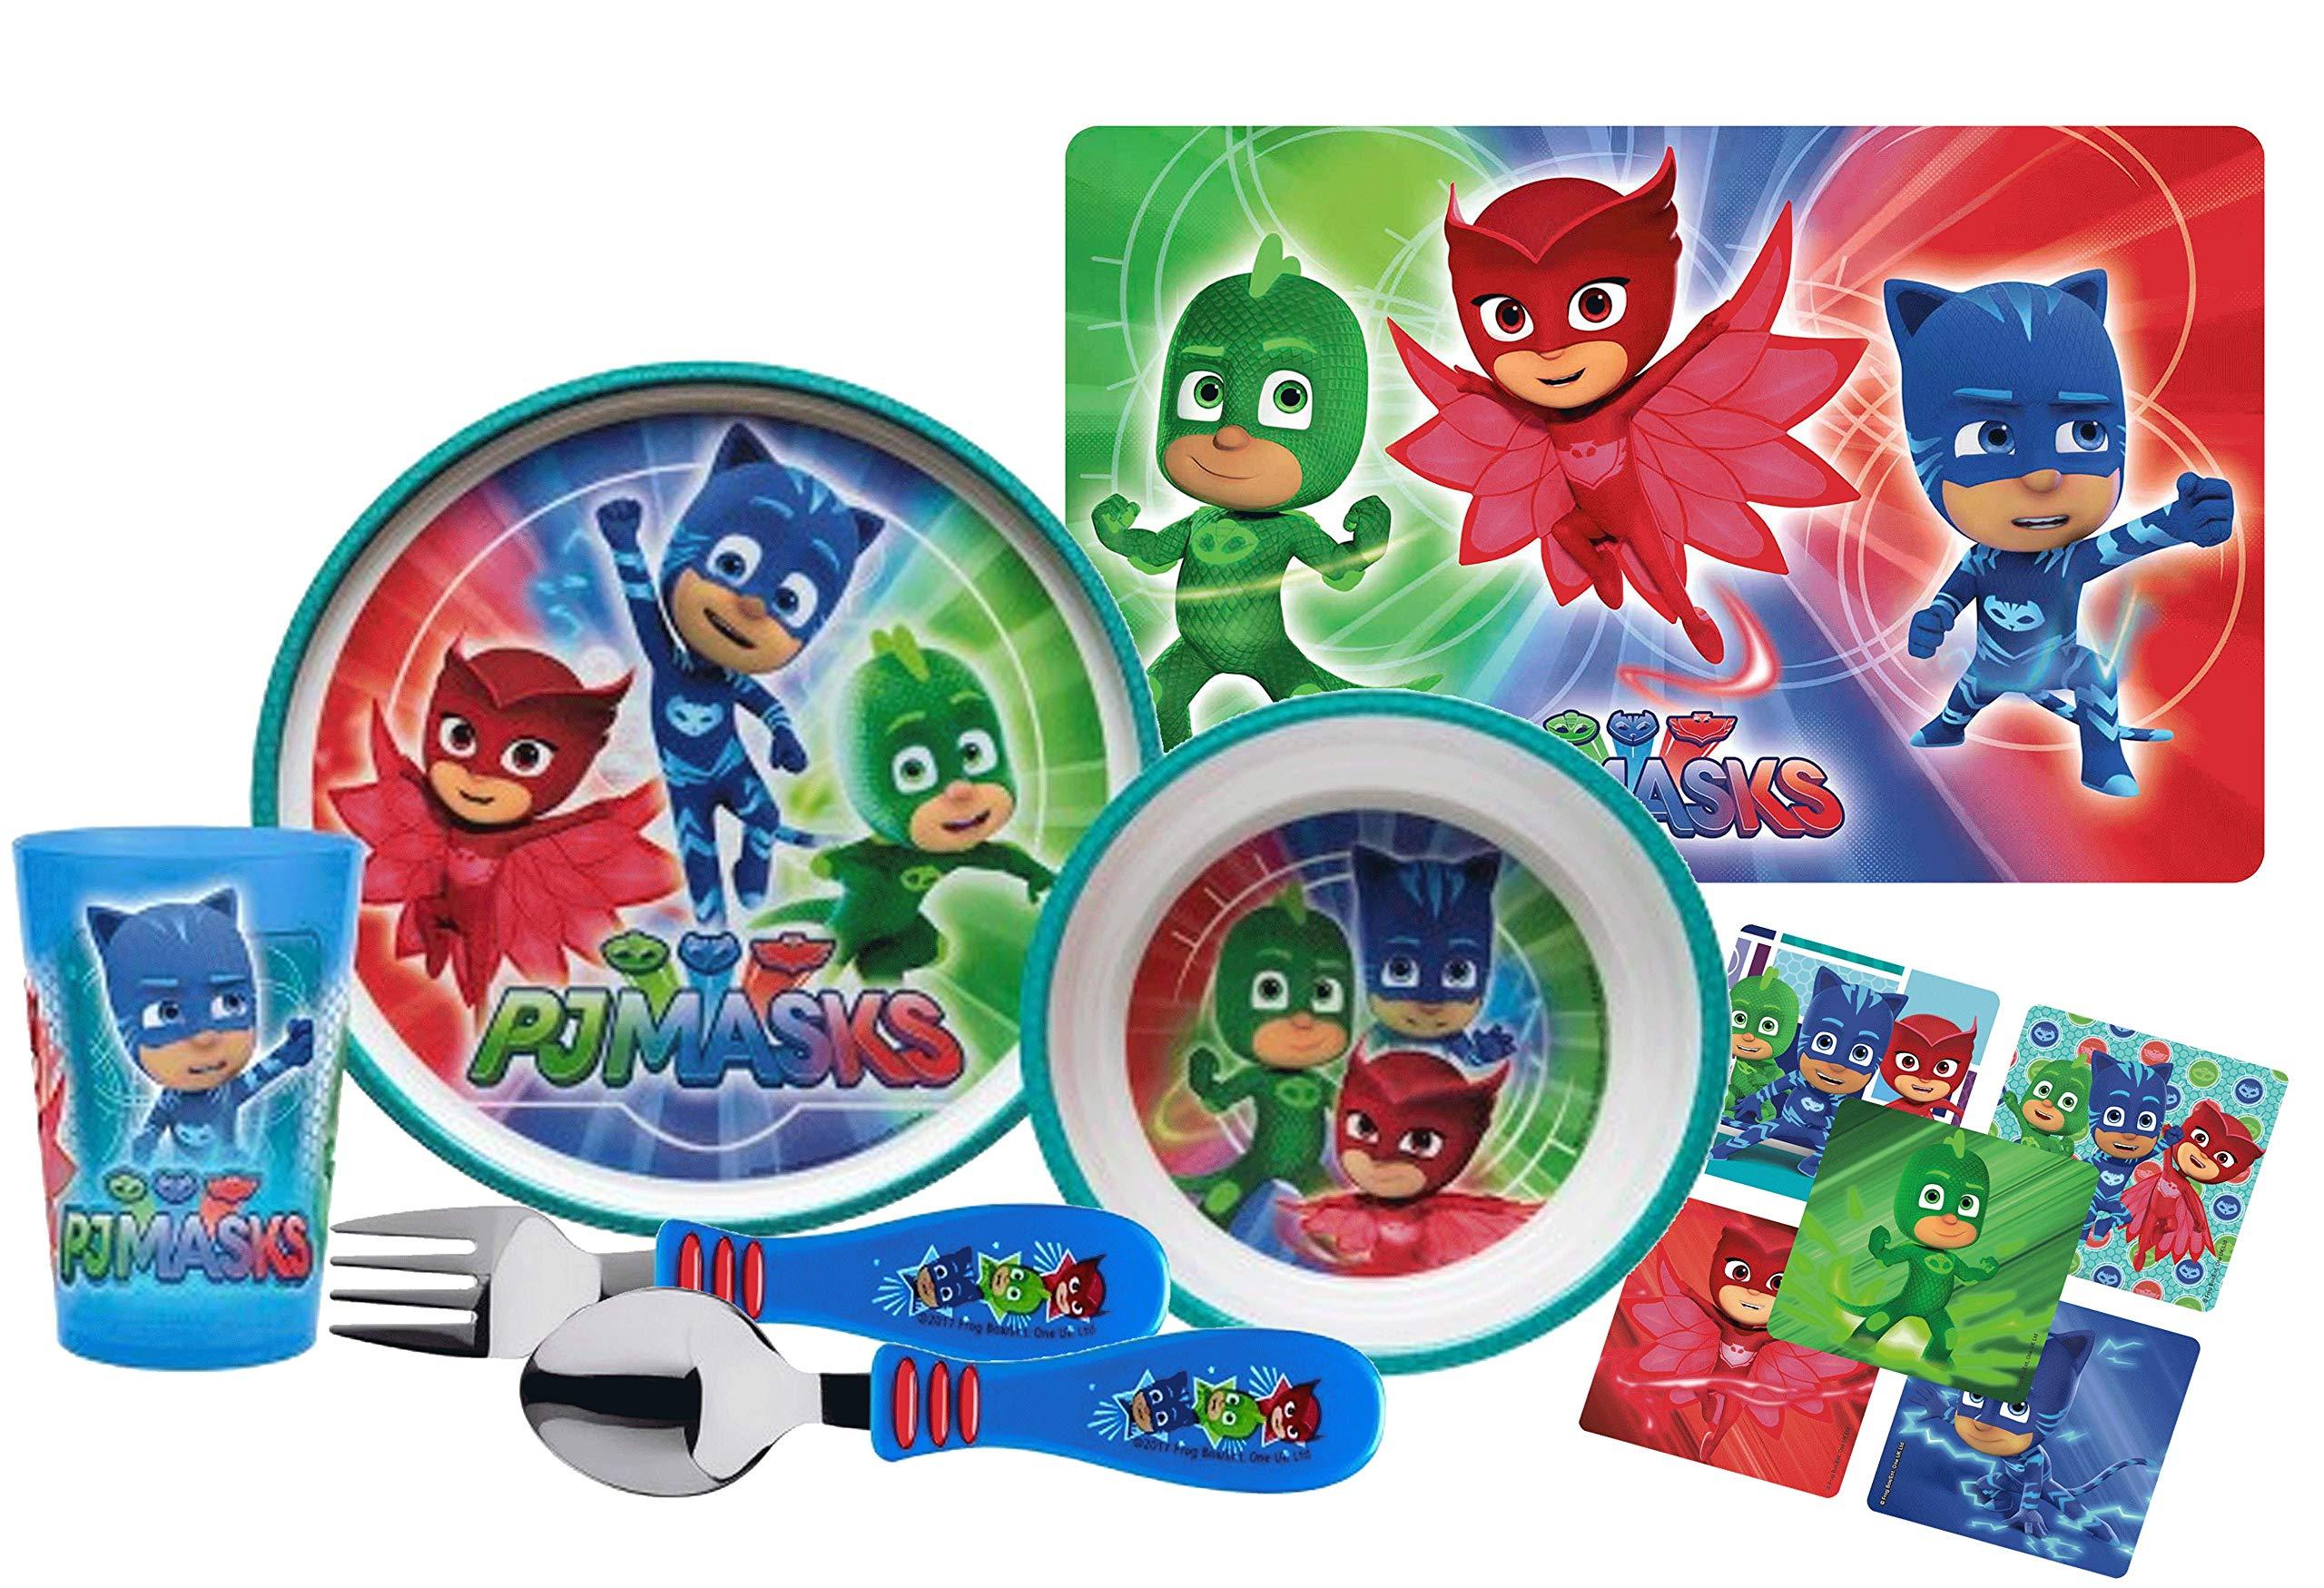 PJ Masks Kids 6pc Dinnerware Set! Includes Plate, Bowl, Tumbler Cup, Place-mat, Fork & Spoon! Featuring Catboy, Owlette & Gekko! BPA-free!